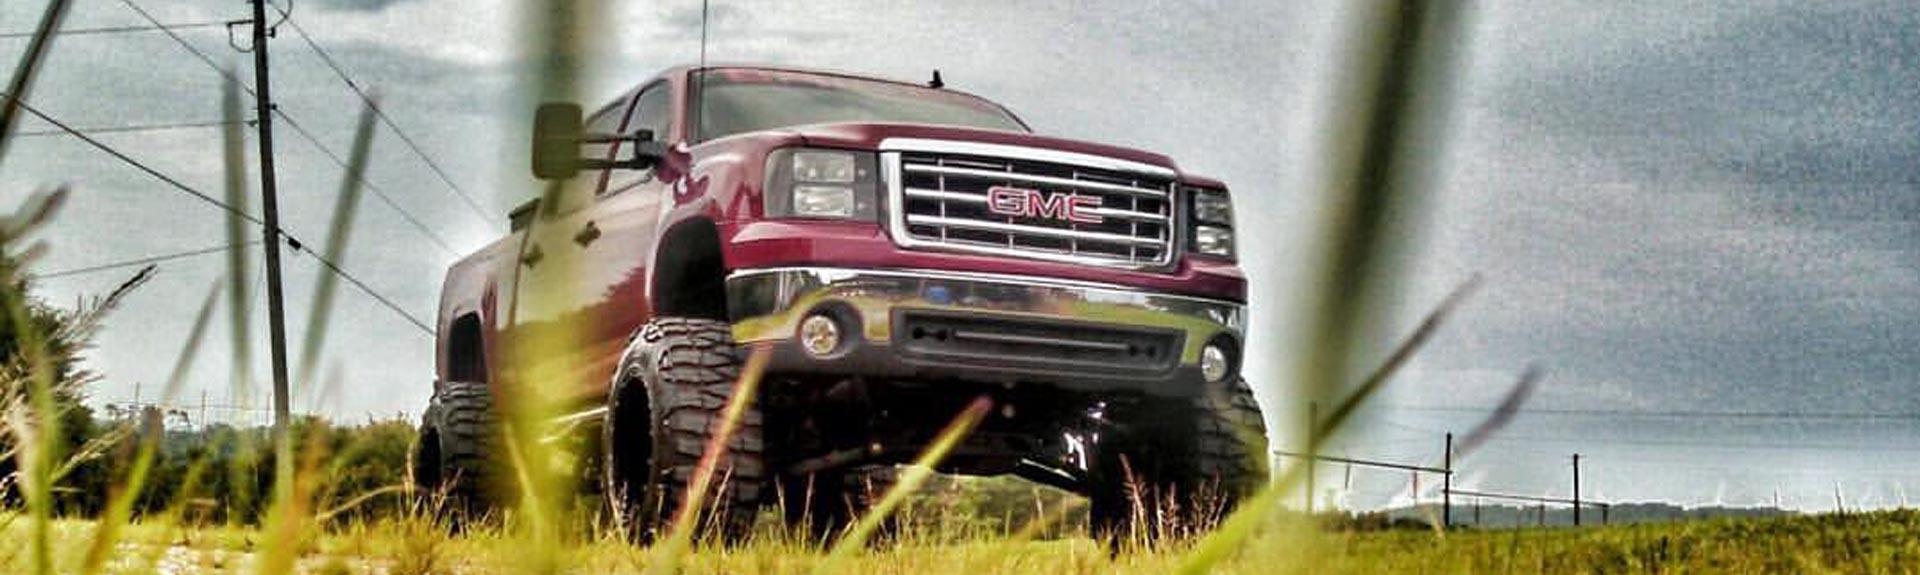 Bridge Street Auto Sales Elkton MD | New & Used Cars Trucks Sales ...